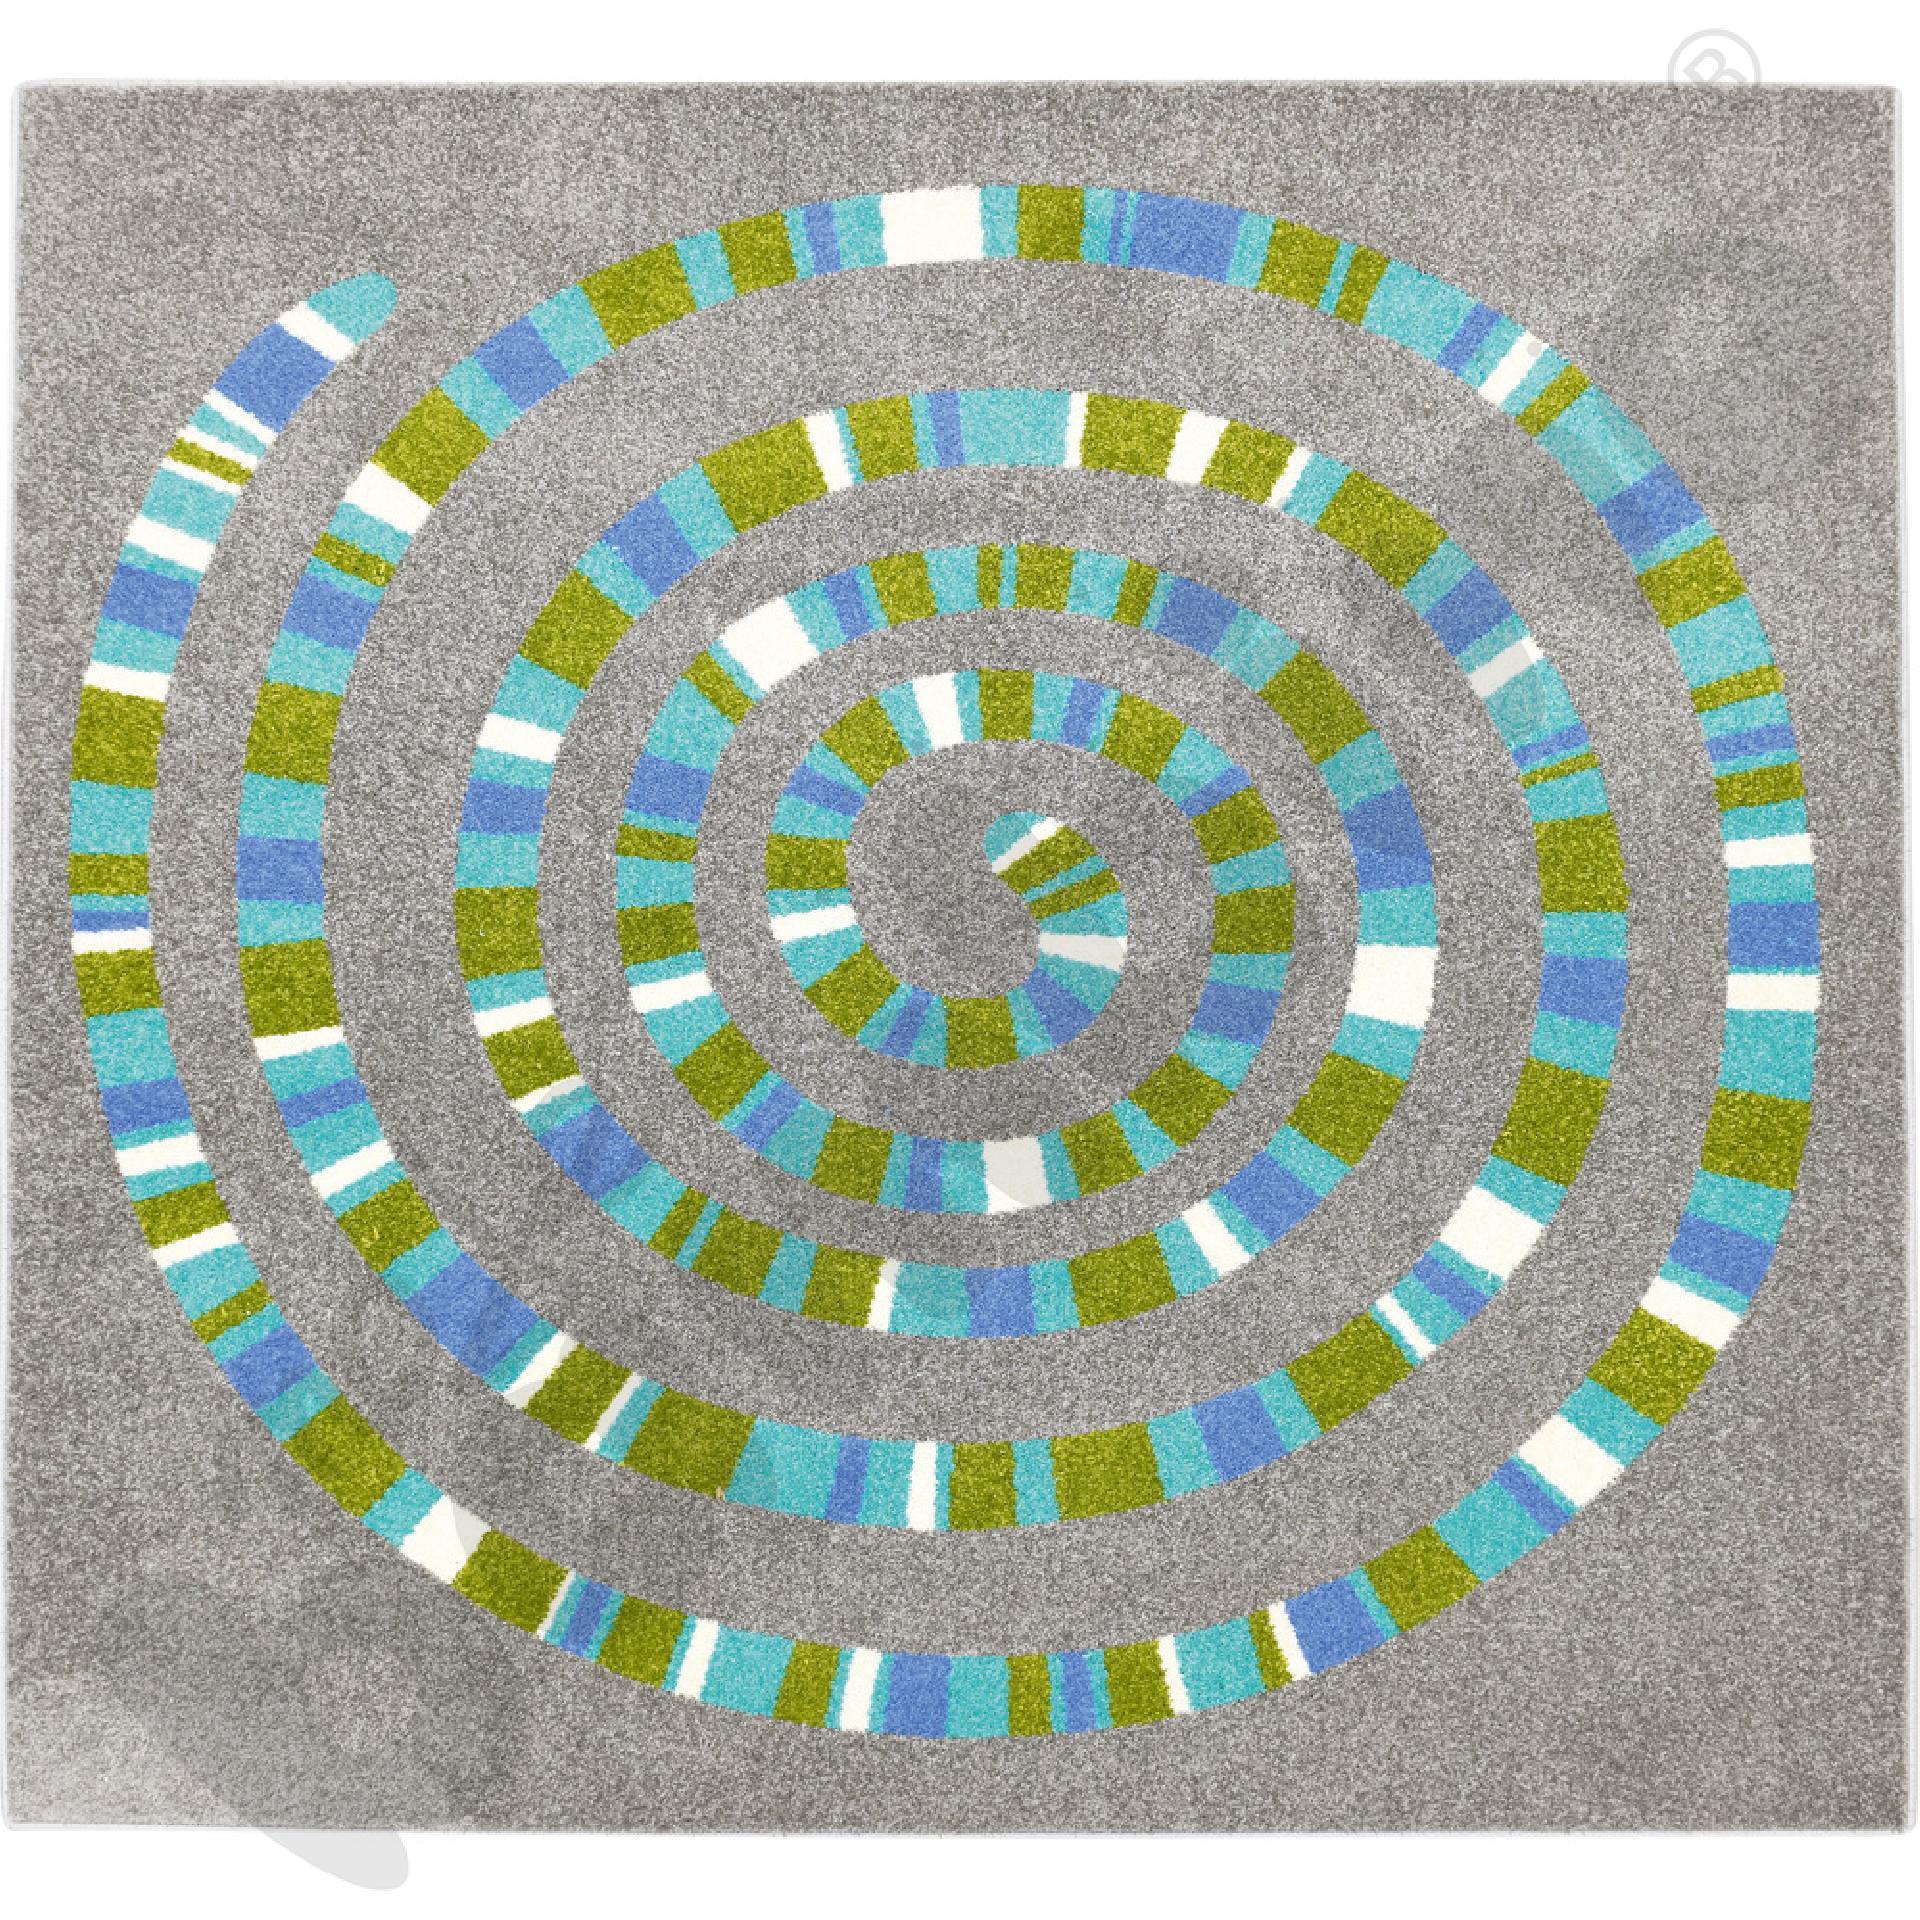 Dywan spirala 3 x 3 m